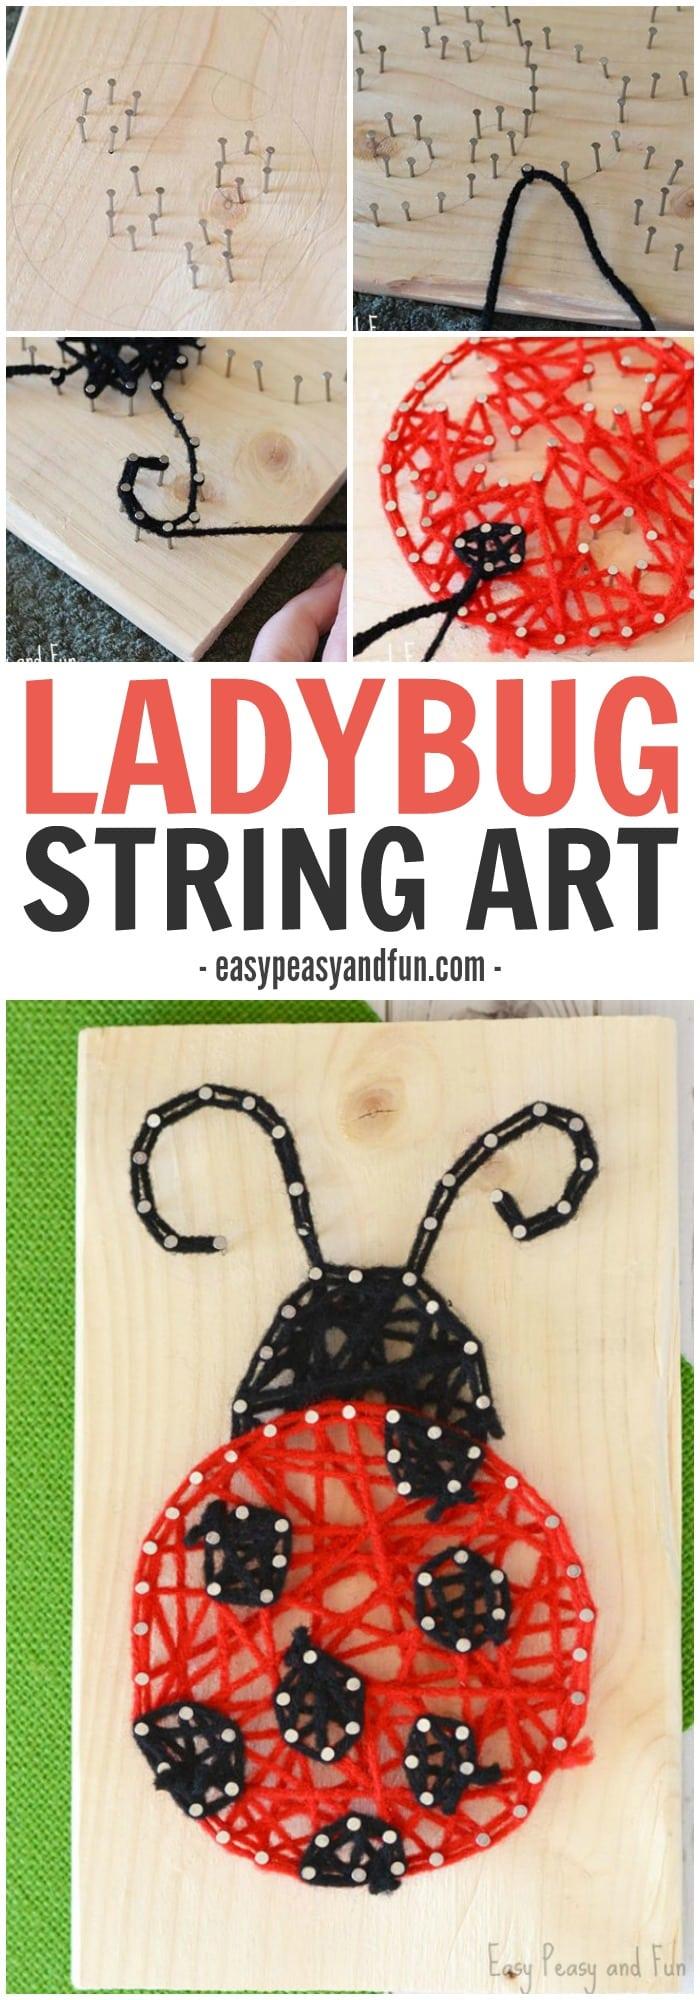 Adorable Ladybug String Art